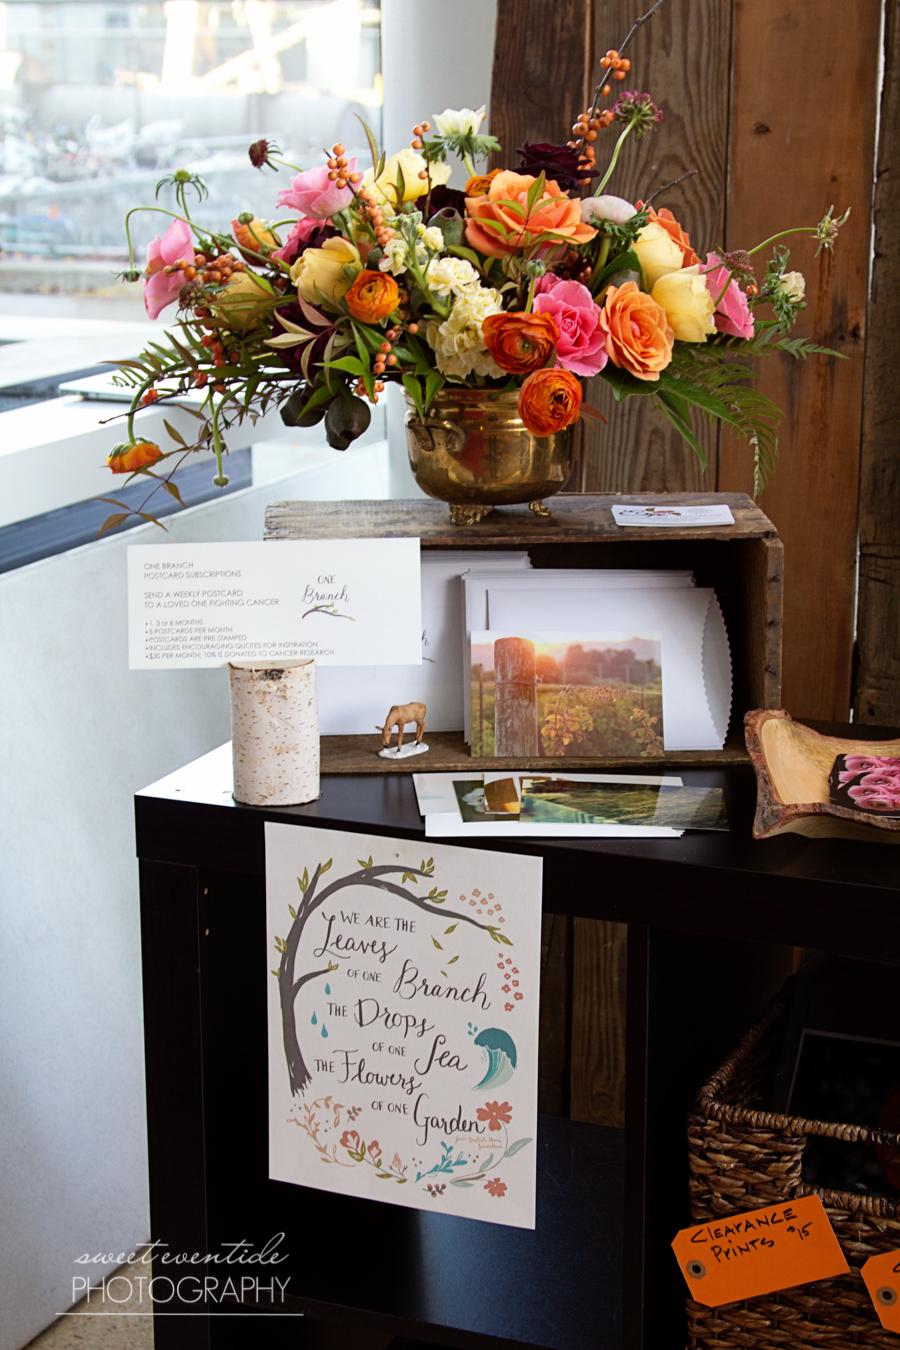 handmade northwest sweet eventide photography booth display